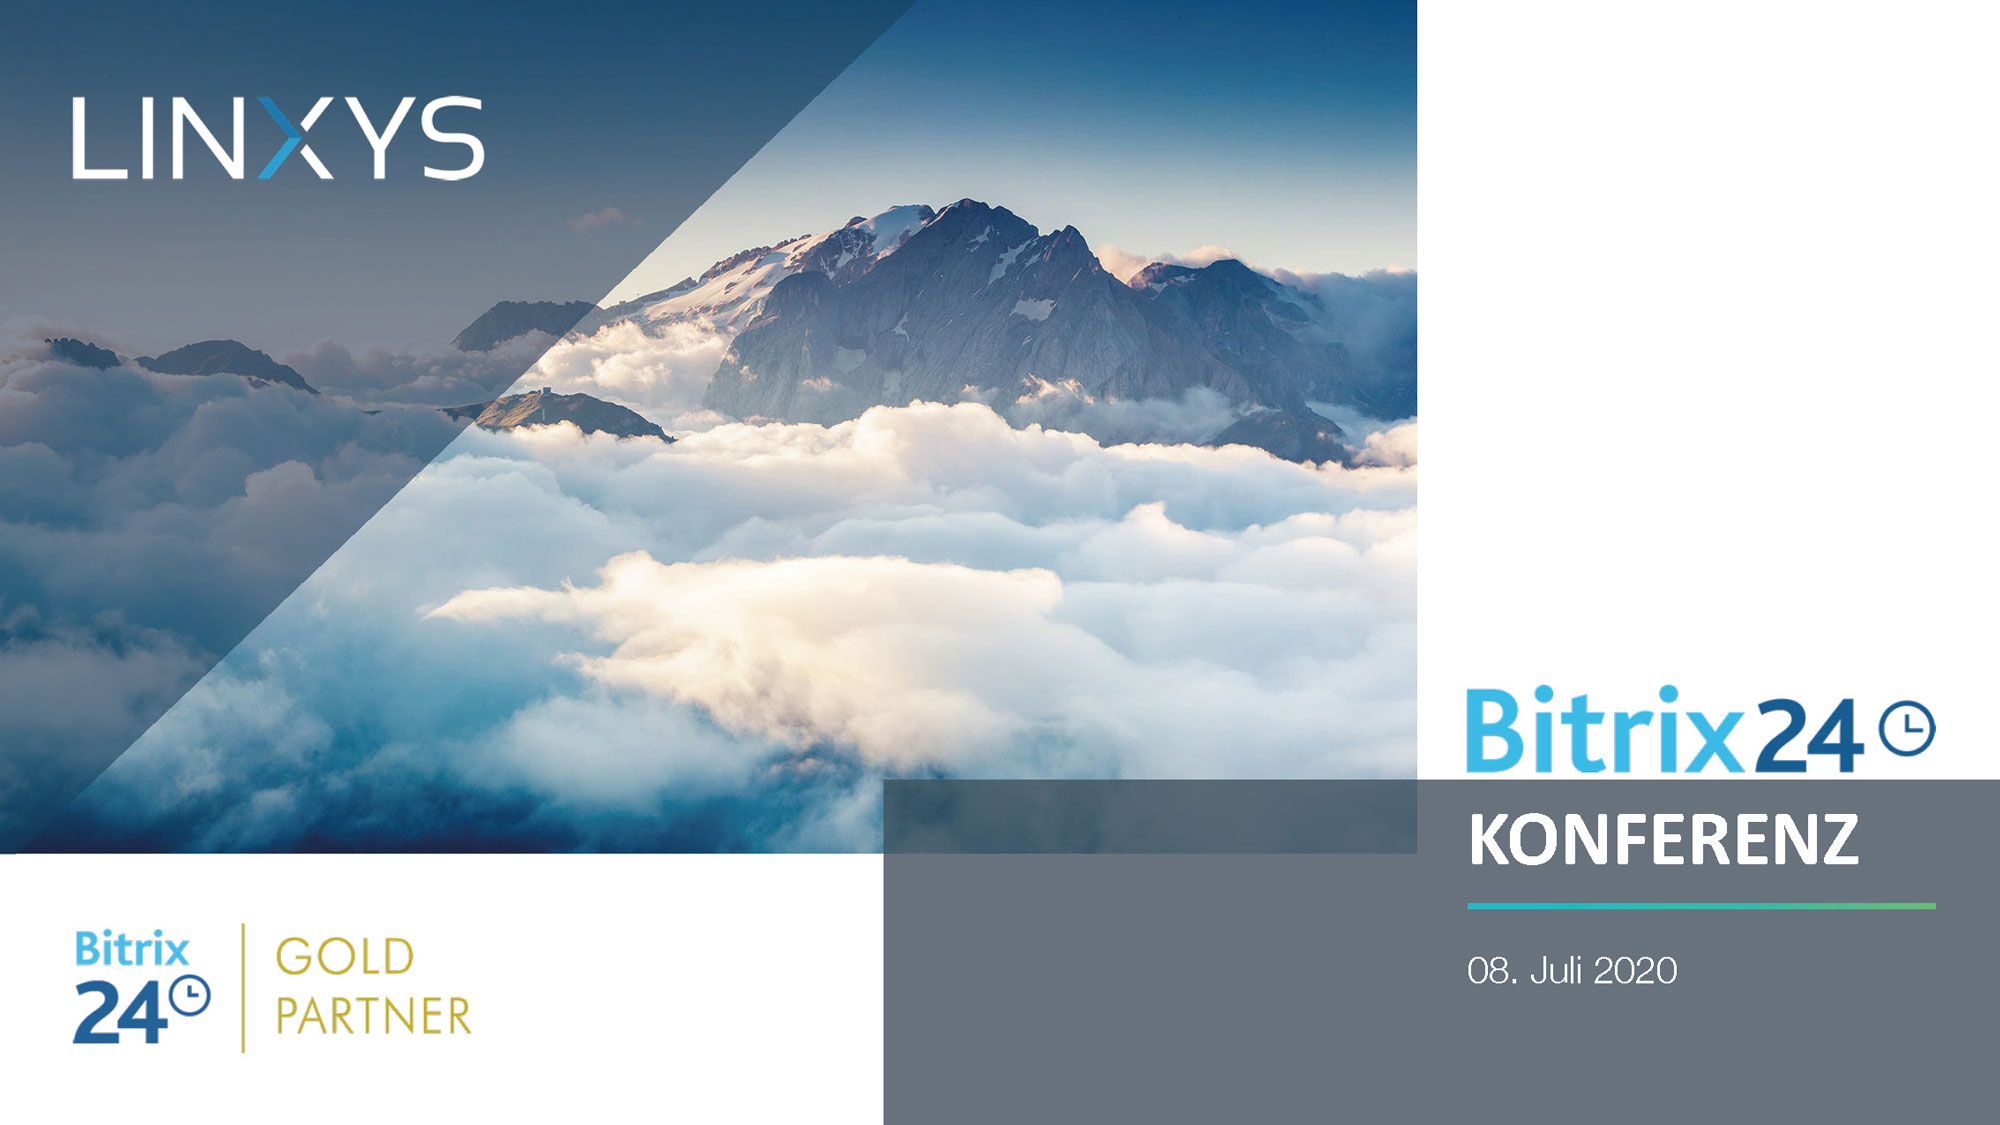 Bitrix24 Konferenz LINXYS Präsentation